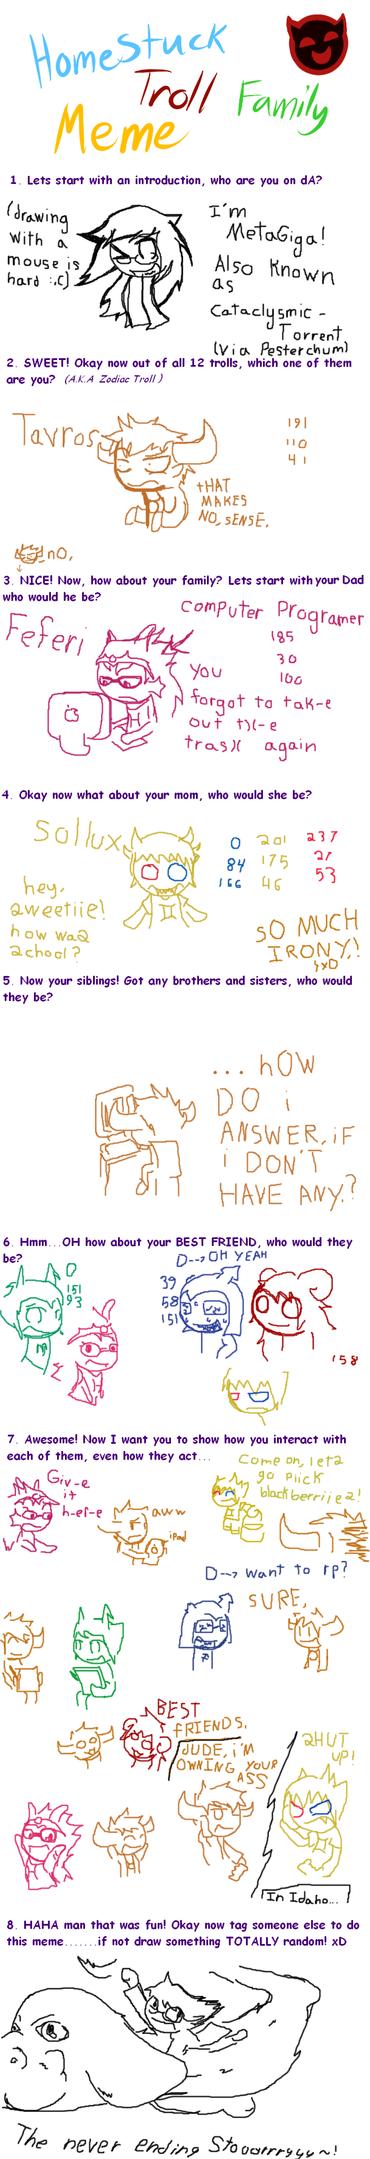 My first Troll Meme! by MetaGiga